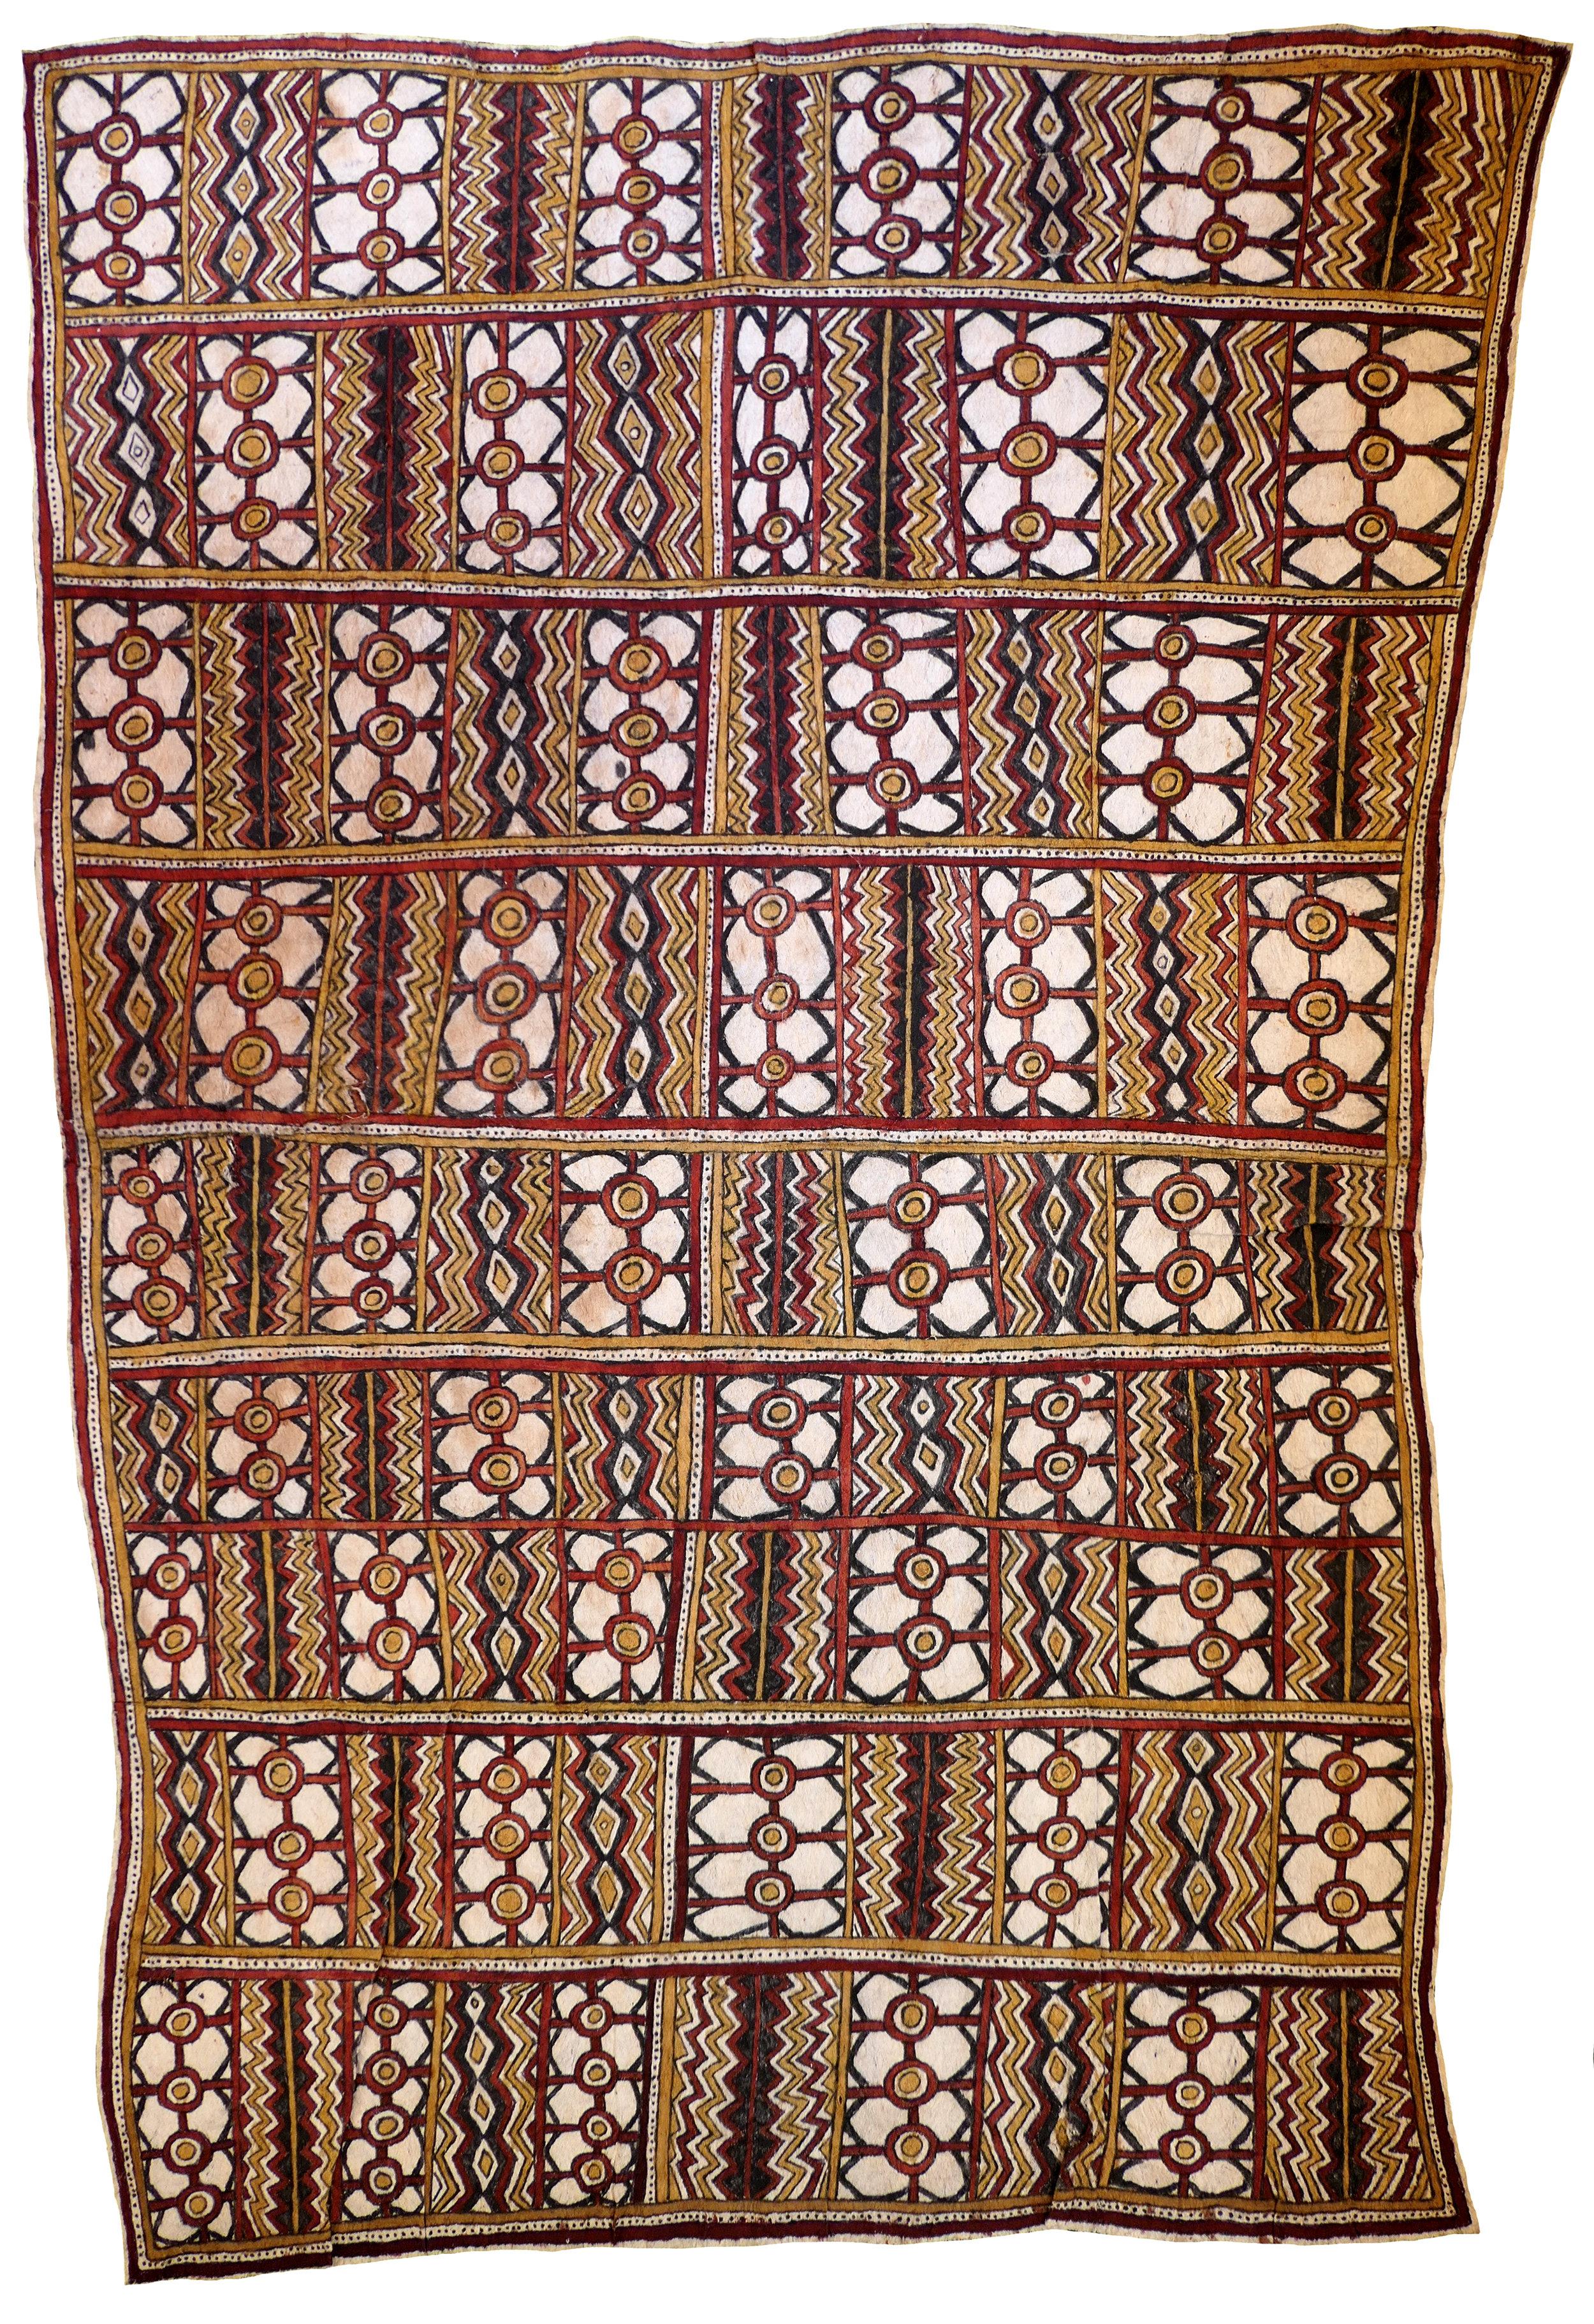 Lila Warrimou (Misaso)    Viojoje dehe, vinohu'e (siha'u'e), vison'e ohu'o sabu ahe   Wings of the butterfly, tattoo design of the bellybutton (fruit of the Sihe tree), eel-bone jewellery for initiation nasal septum piercings, and spots of the wood-boring grub  118 x 82.5cm  Natural pigments on nioge (barkcloth), 2012